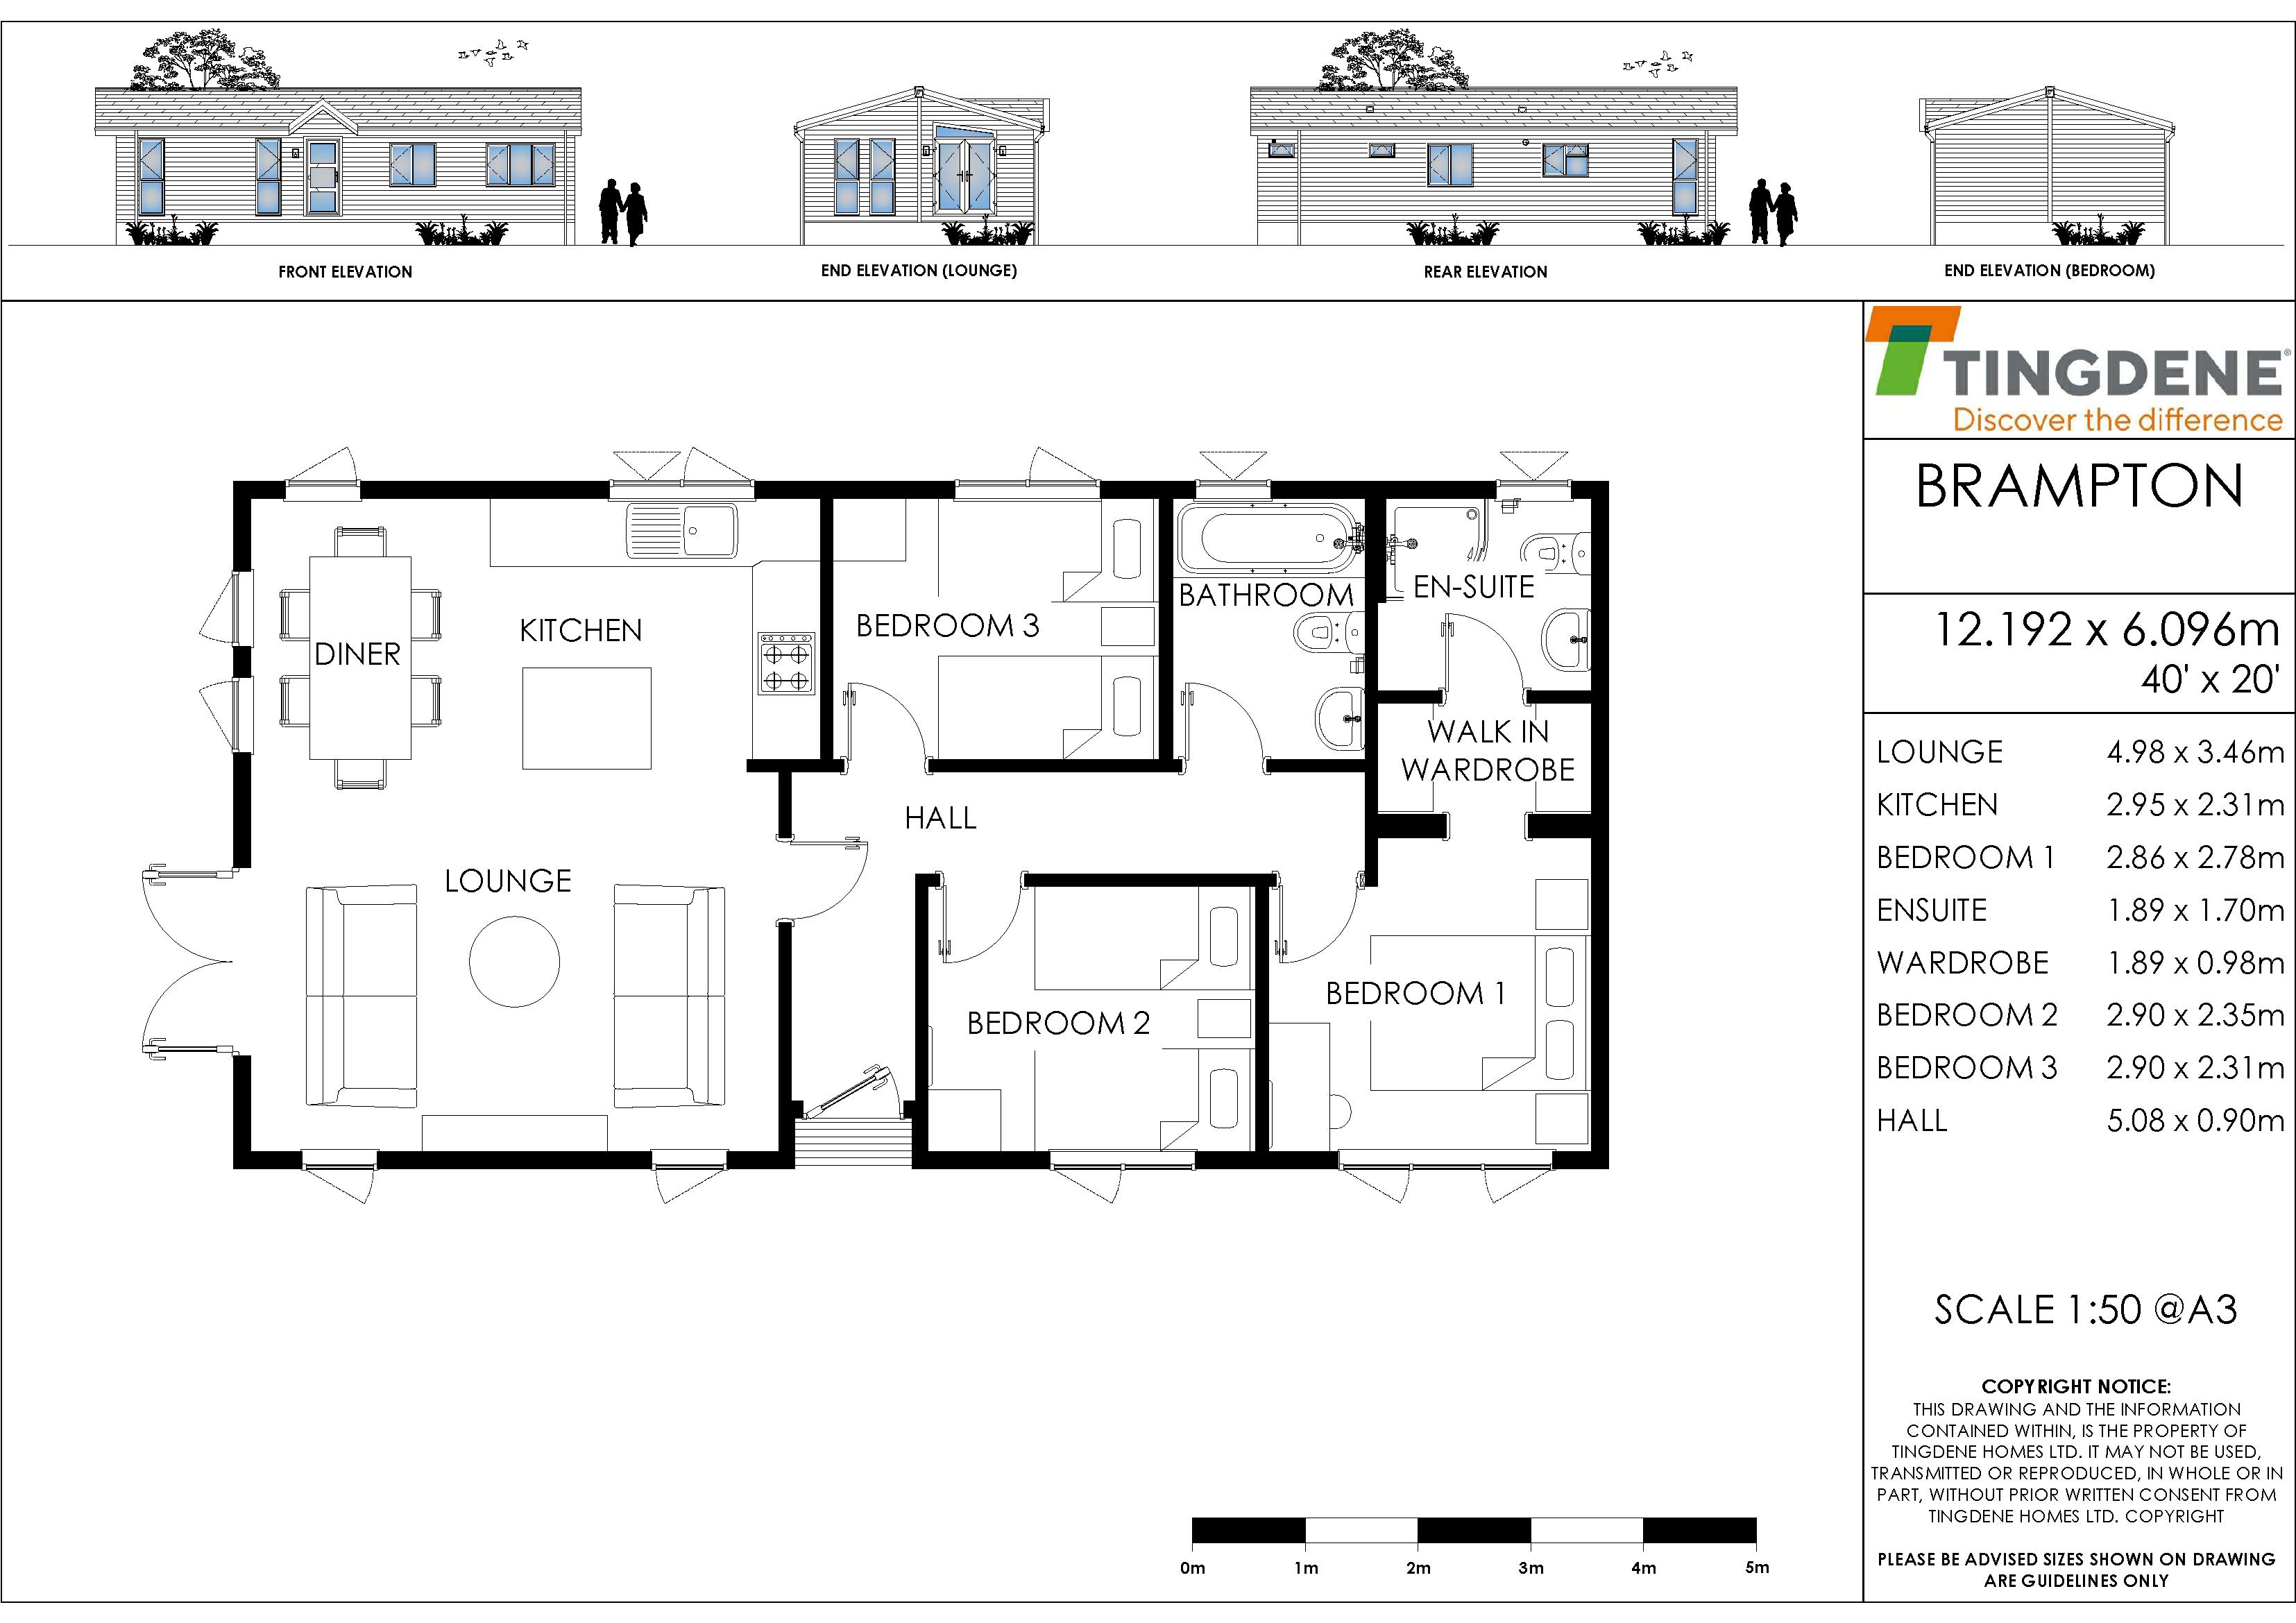 The Brampton floorplan